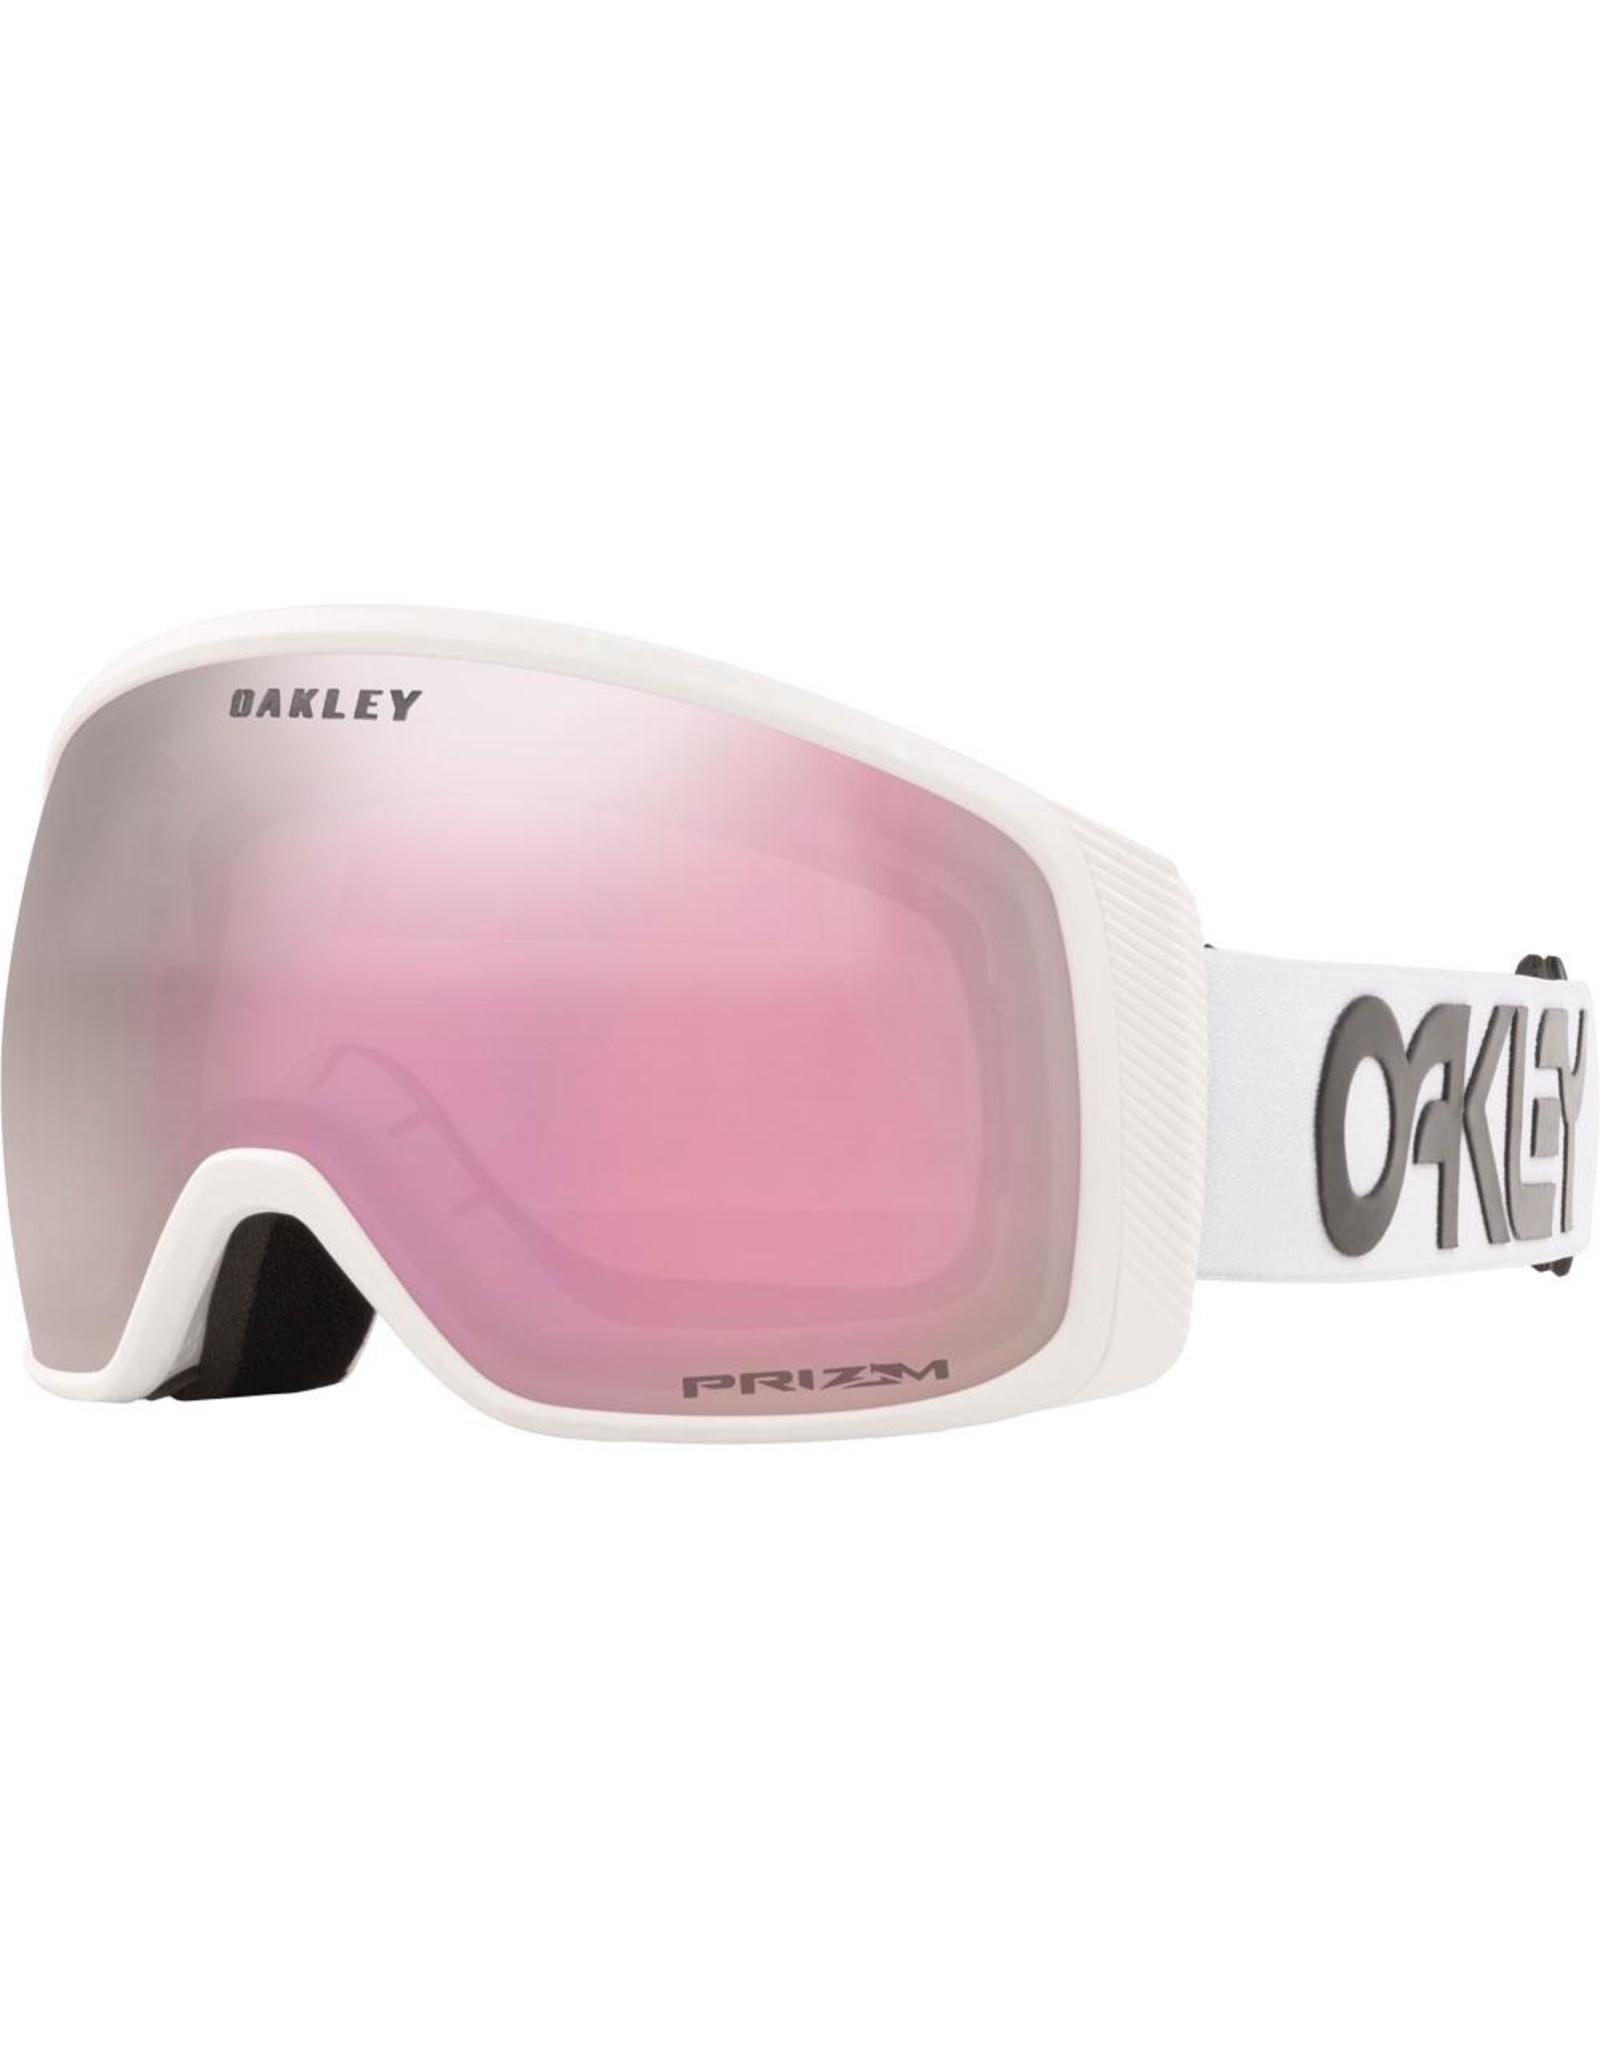 OAKLEY Flight Tracker XM FP Wht wPrizm Pink